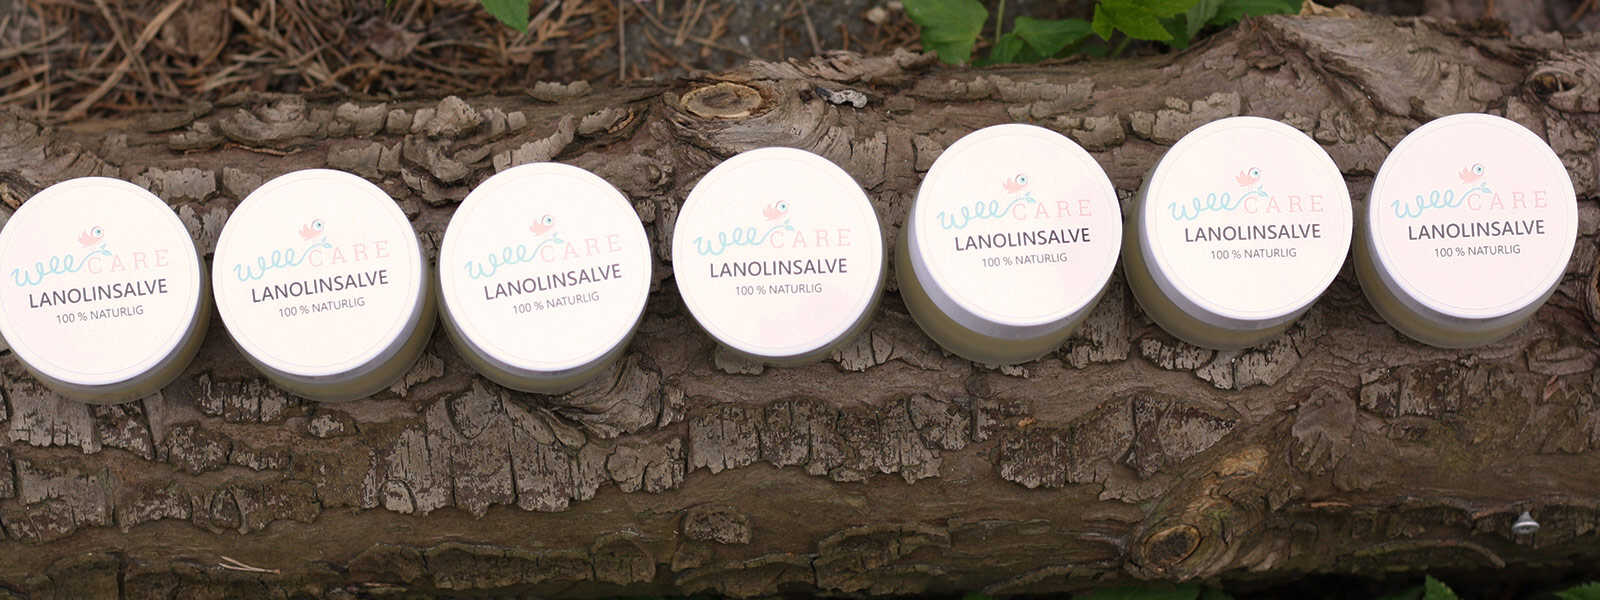 lanolinsalve-toerre-haender-sprukken-hud-weecare